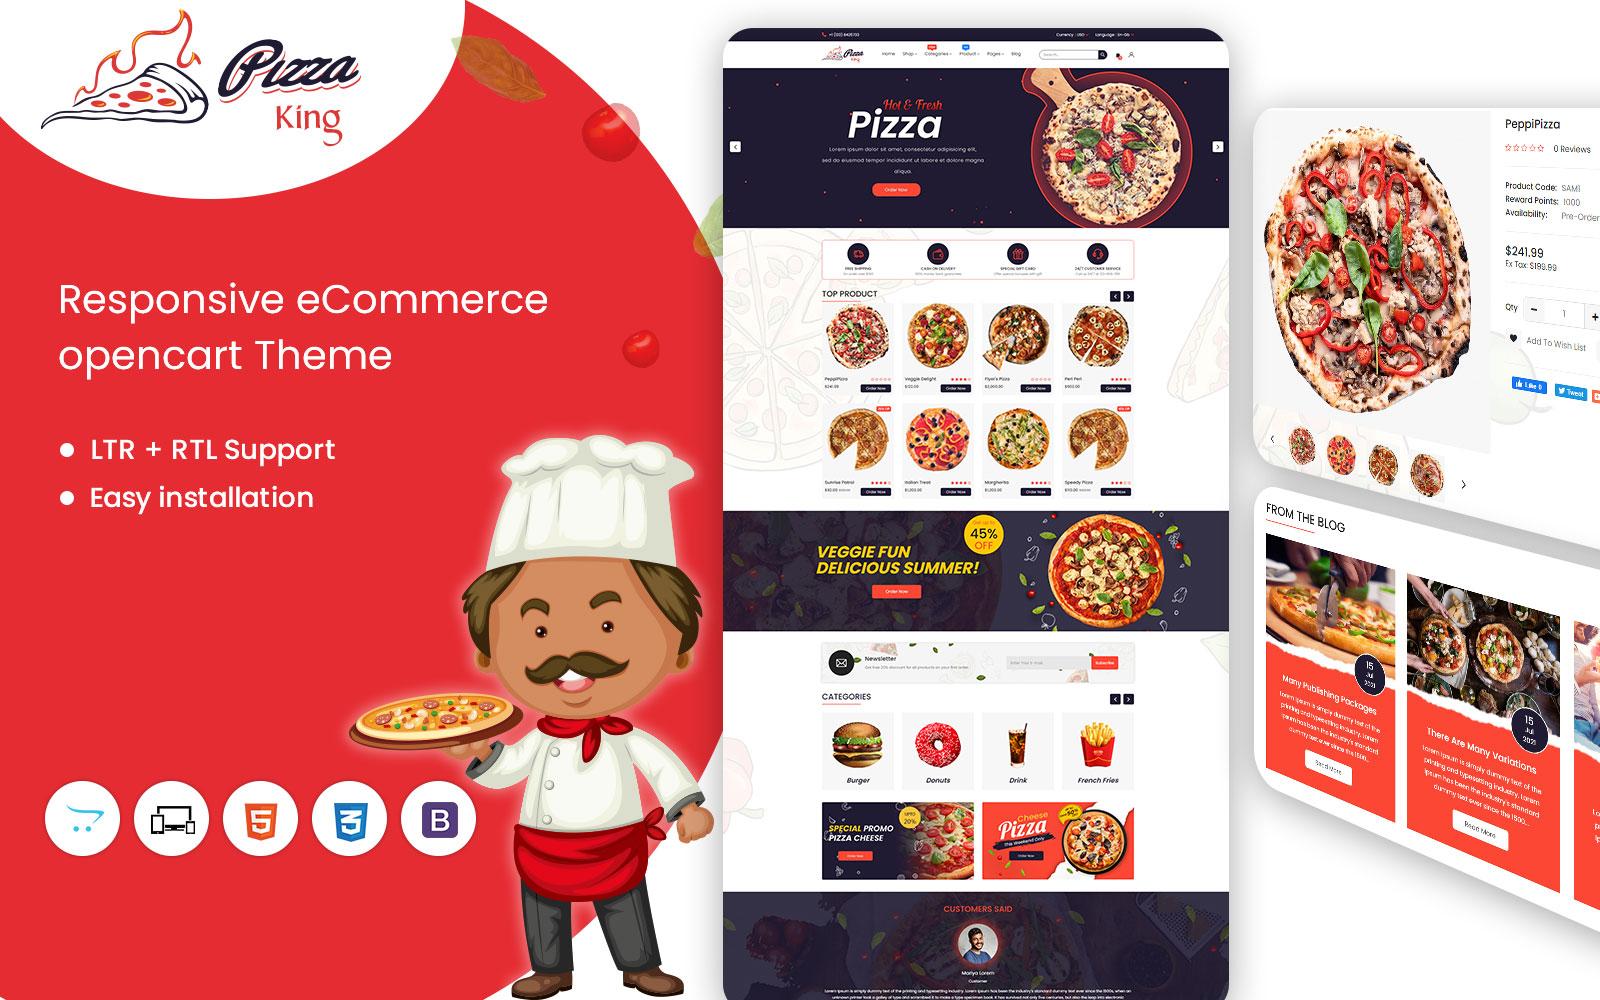 Pizzaking Online Restaurant Responsive OpenCart Template